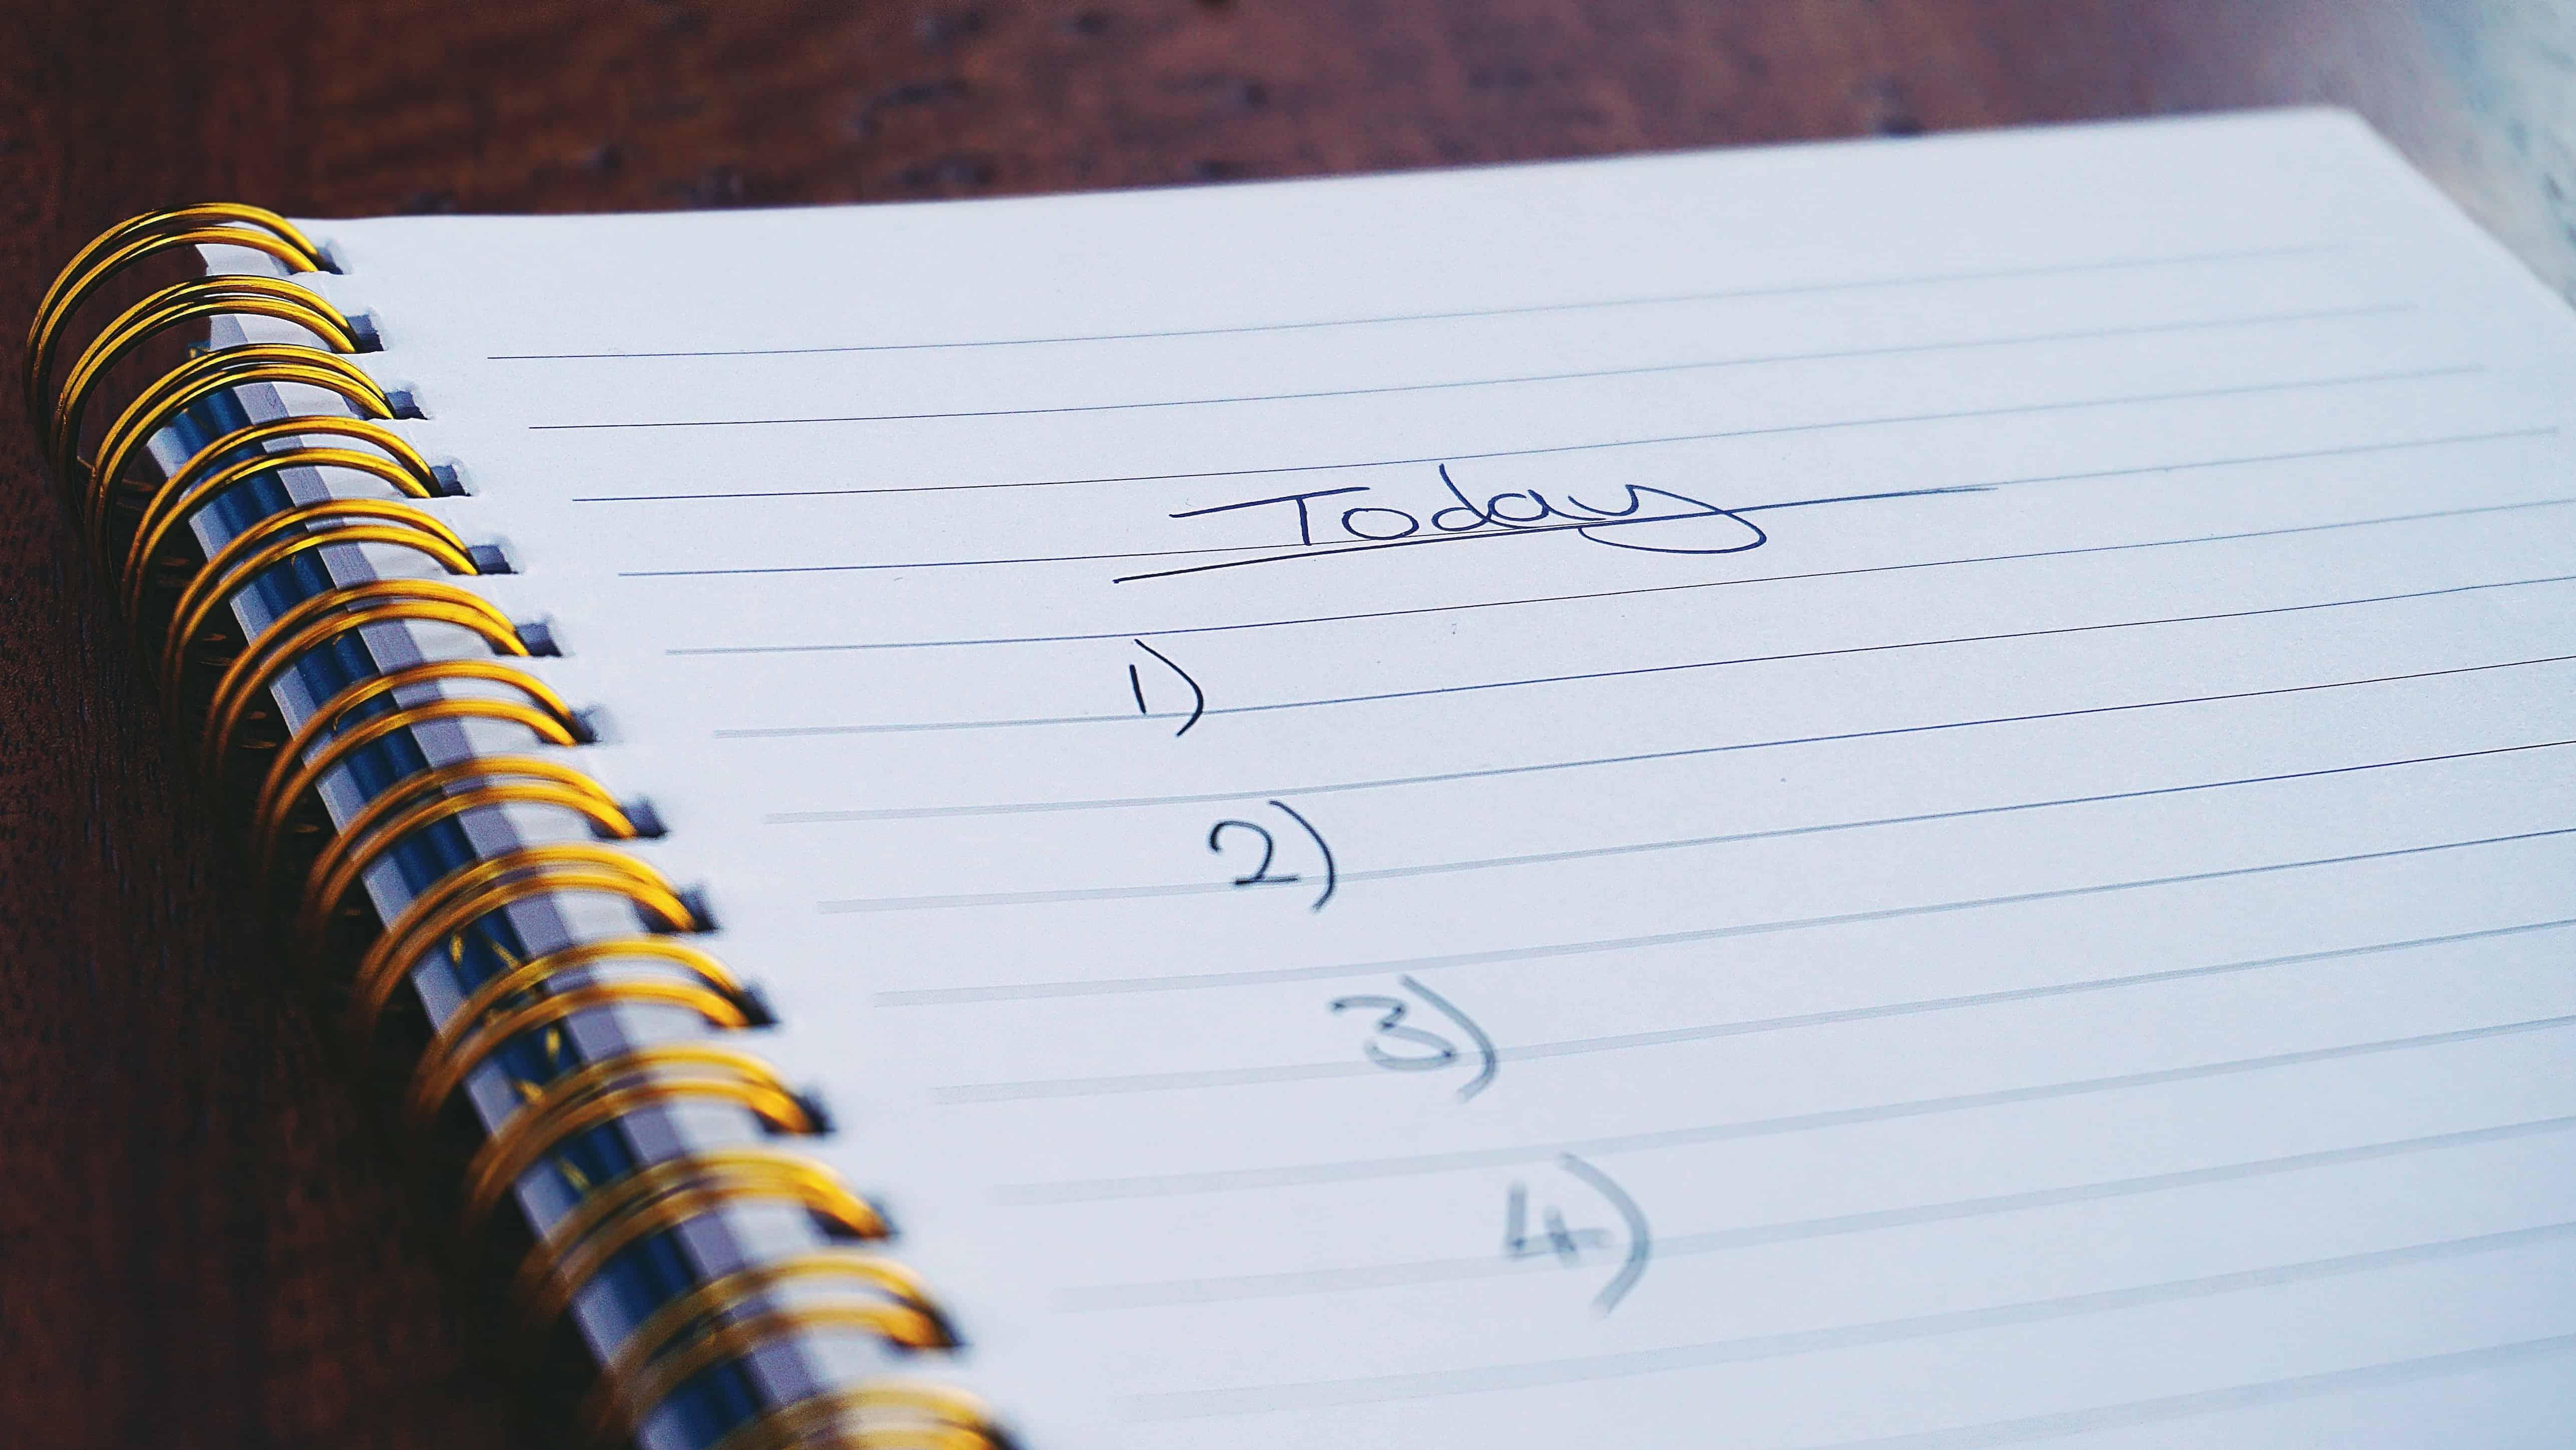 treasurers end of year checklist